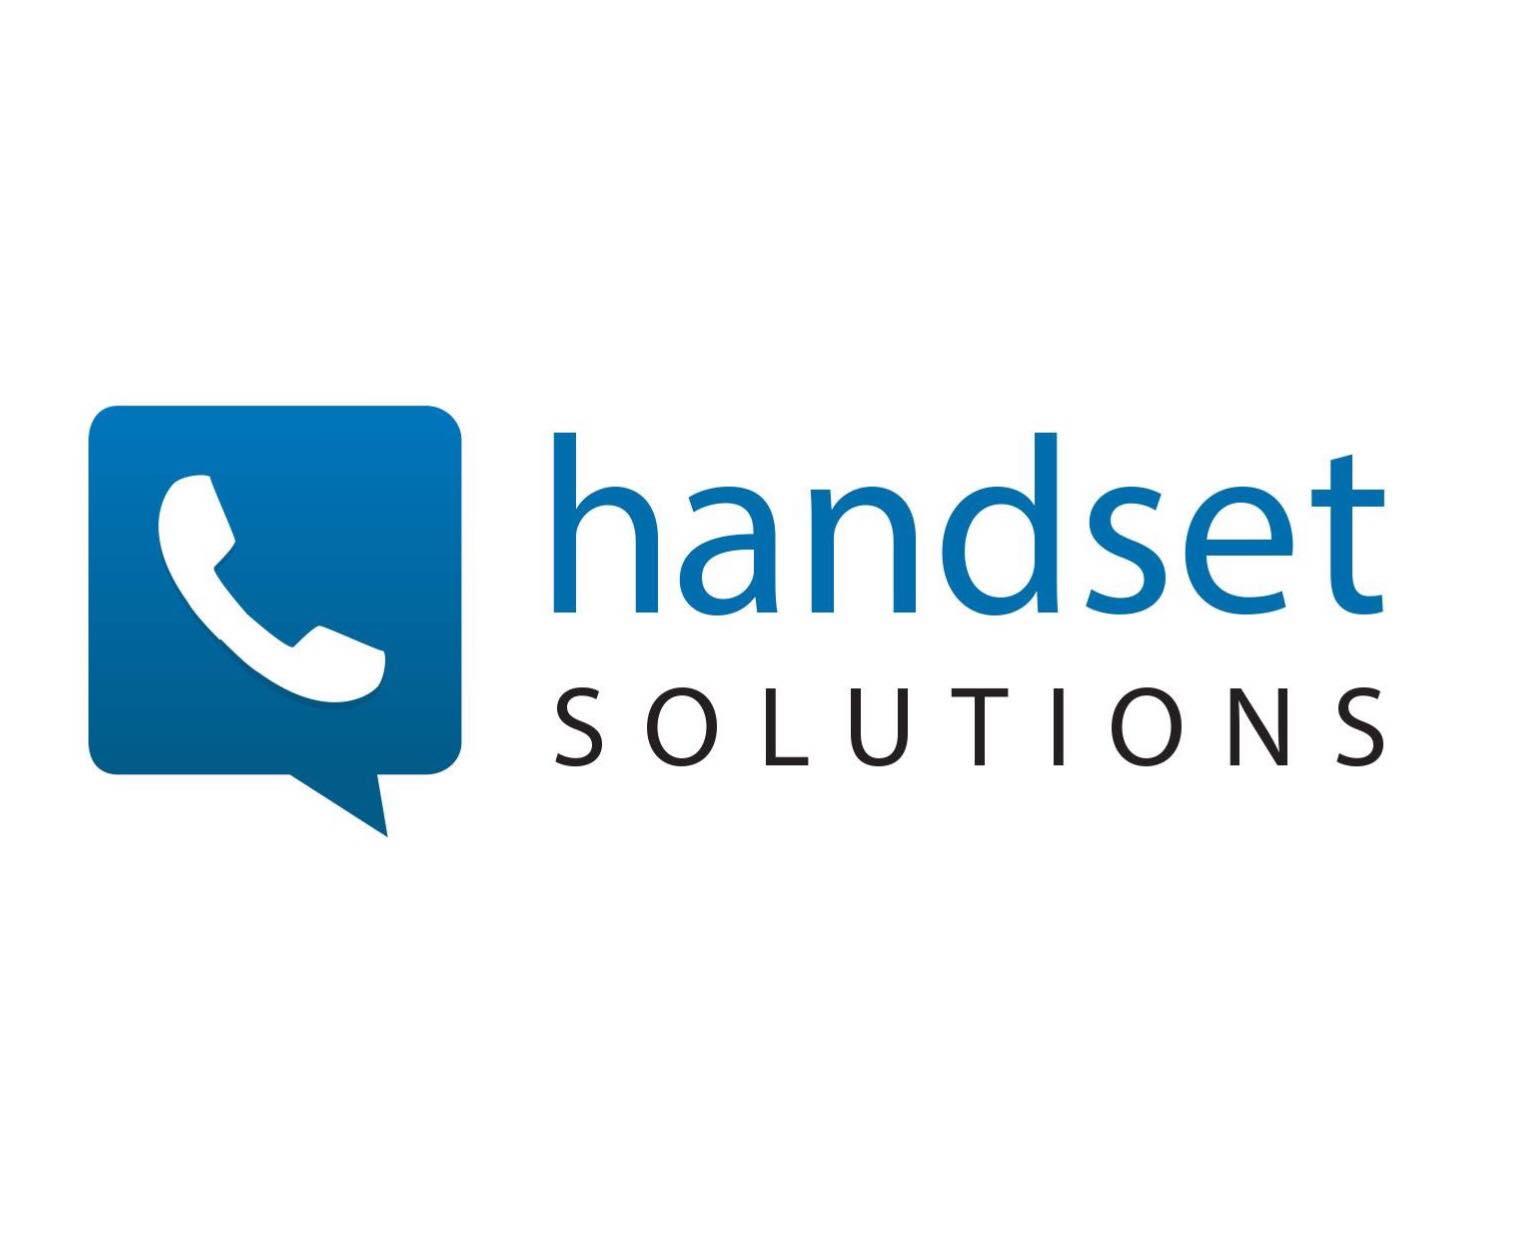 Handset Solutions